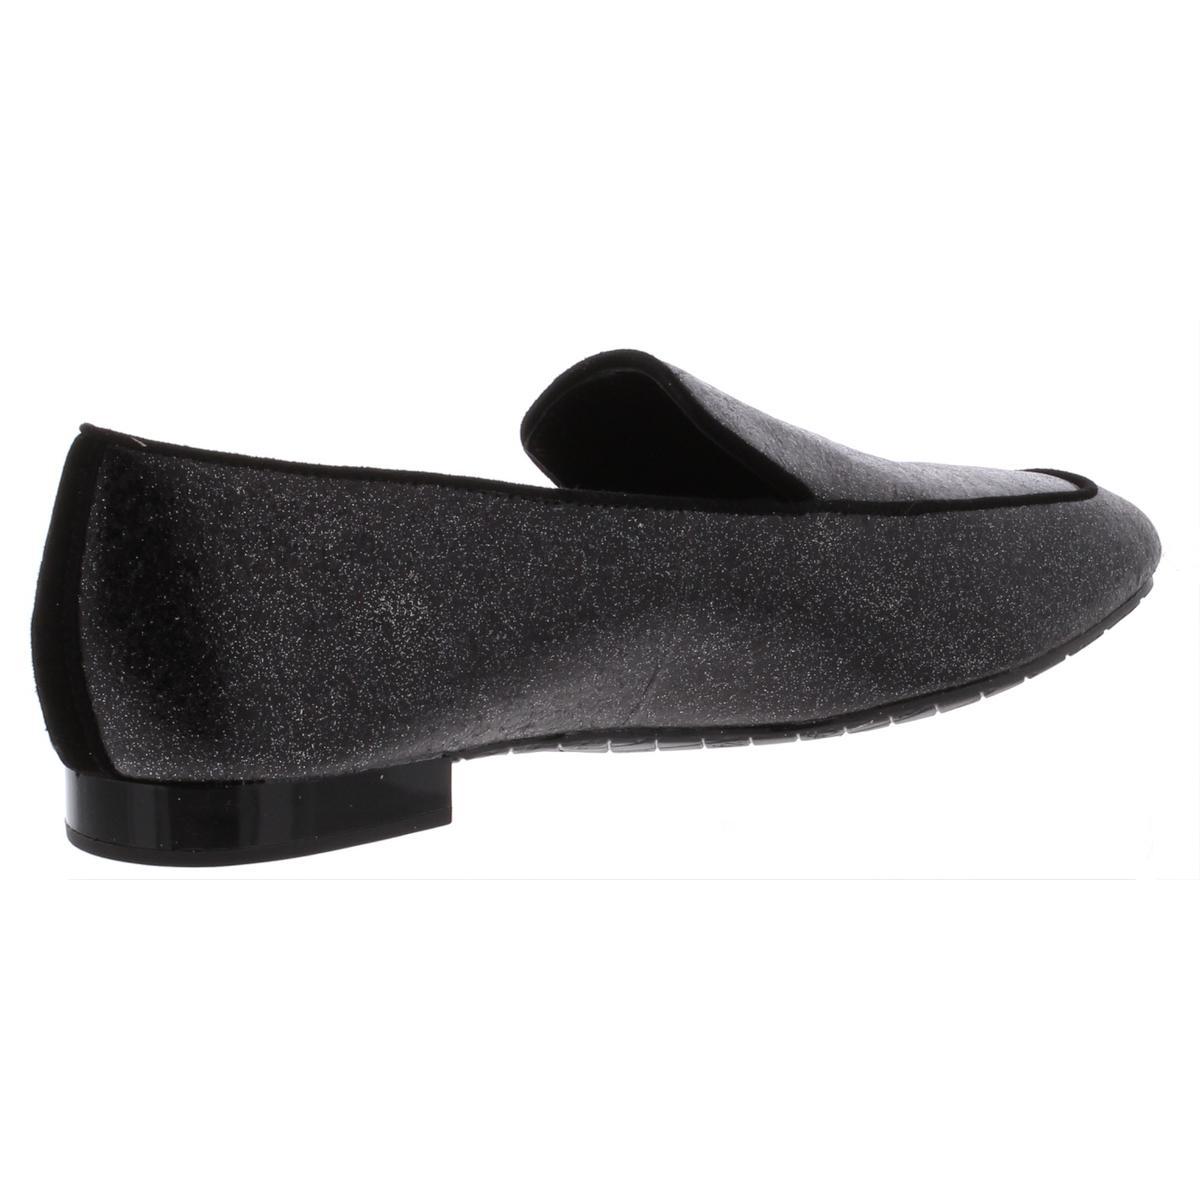 Donald-J-Pliner-Womens-Honey-Slip-On-Loafers-Shoes-BHFO-7808 thumbnail 10